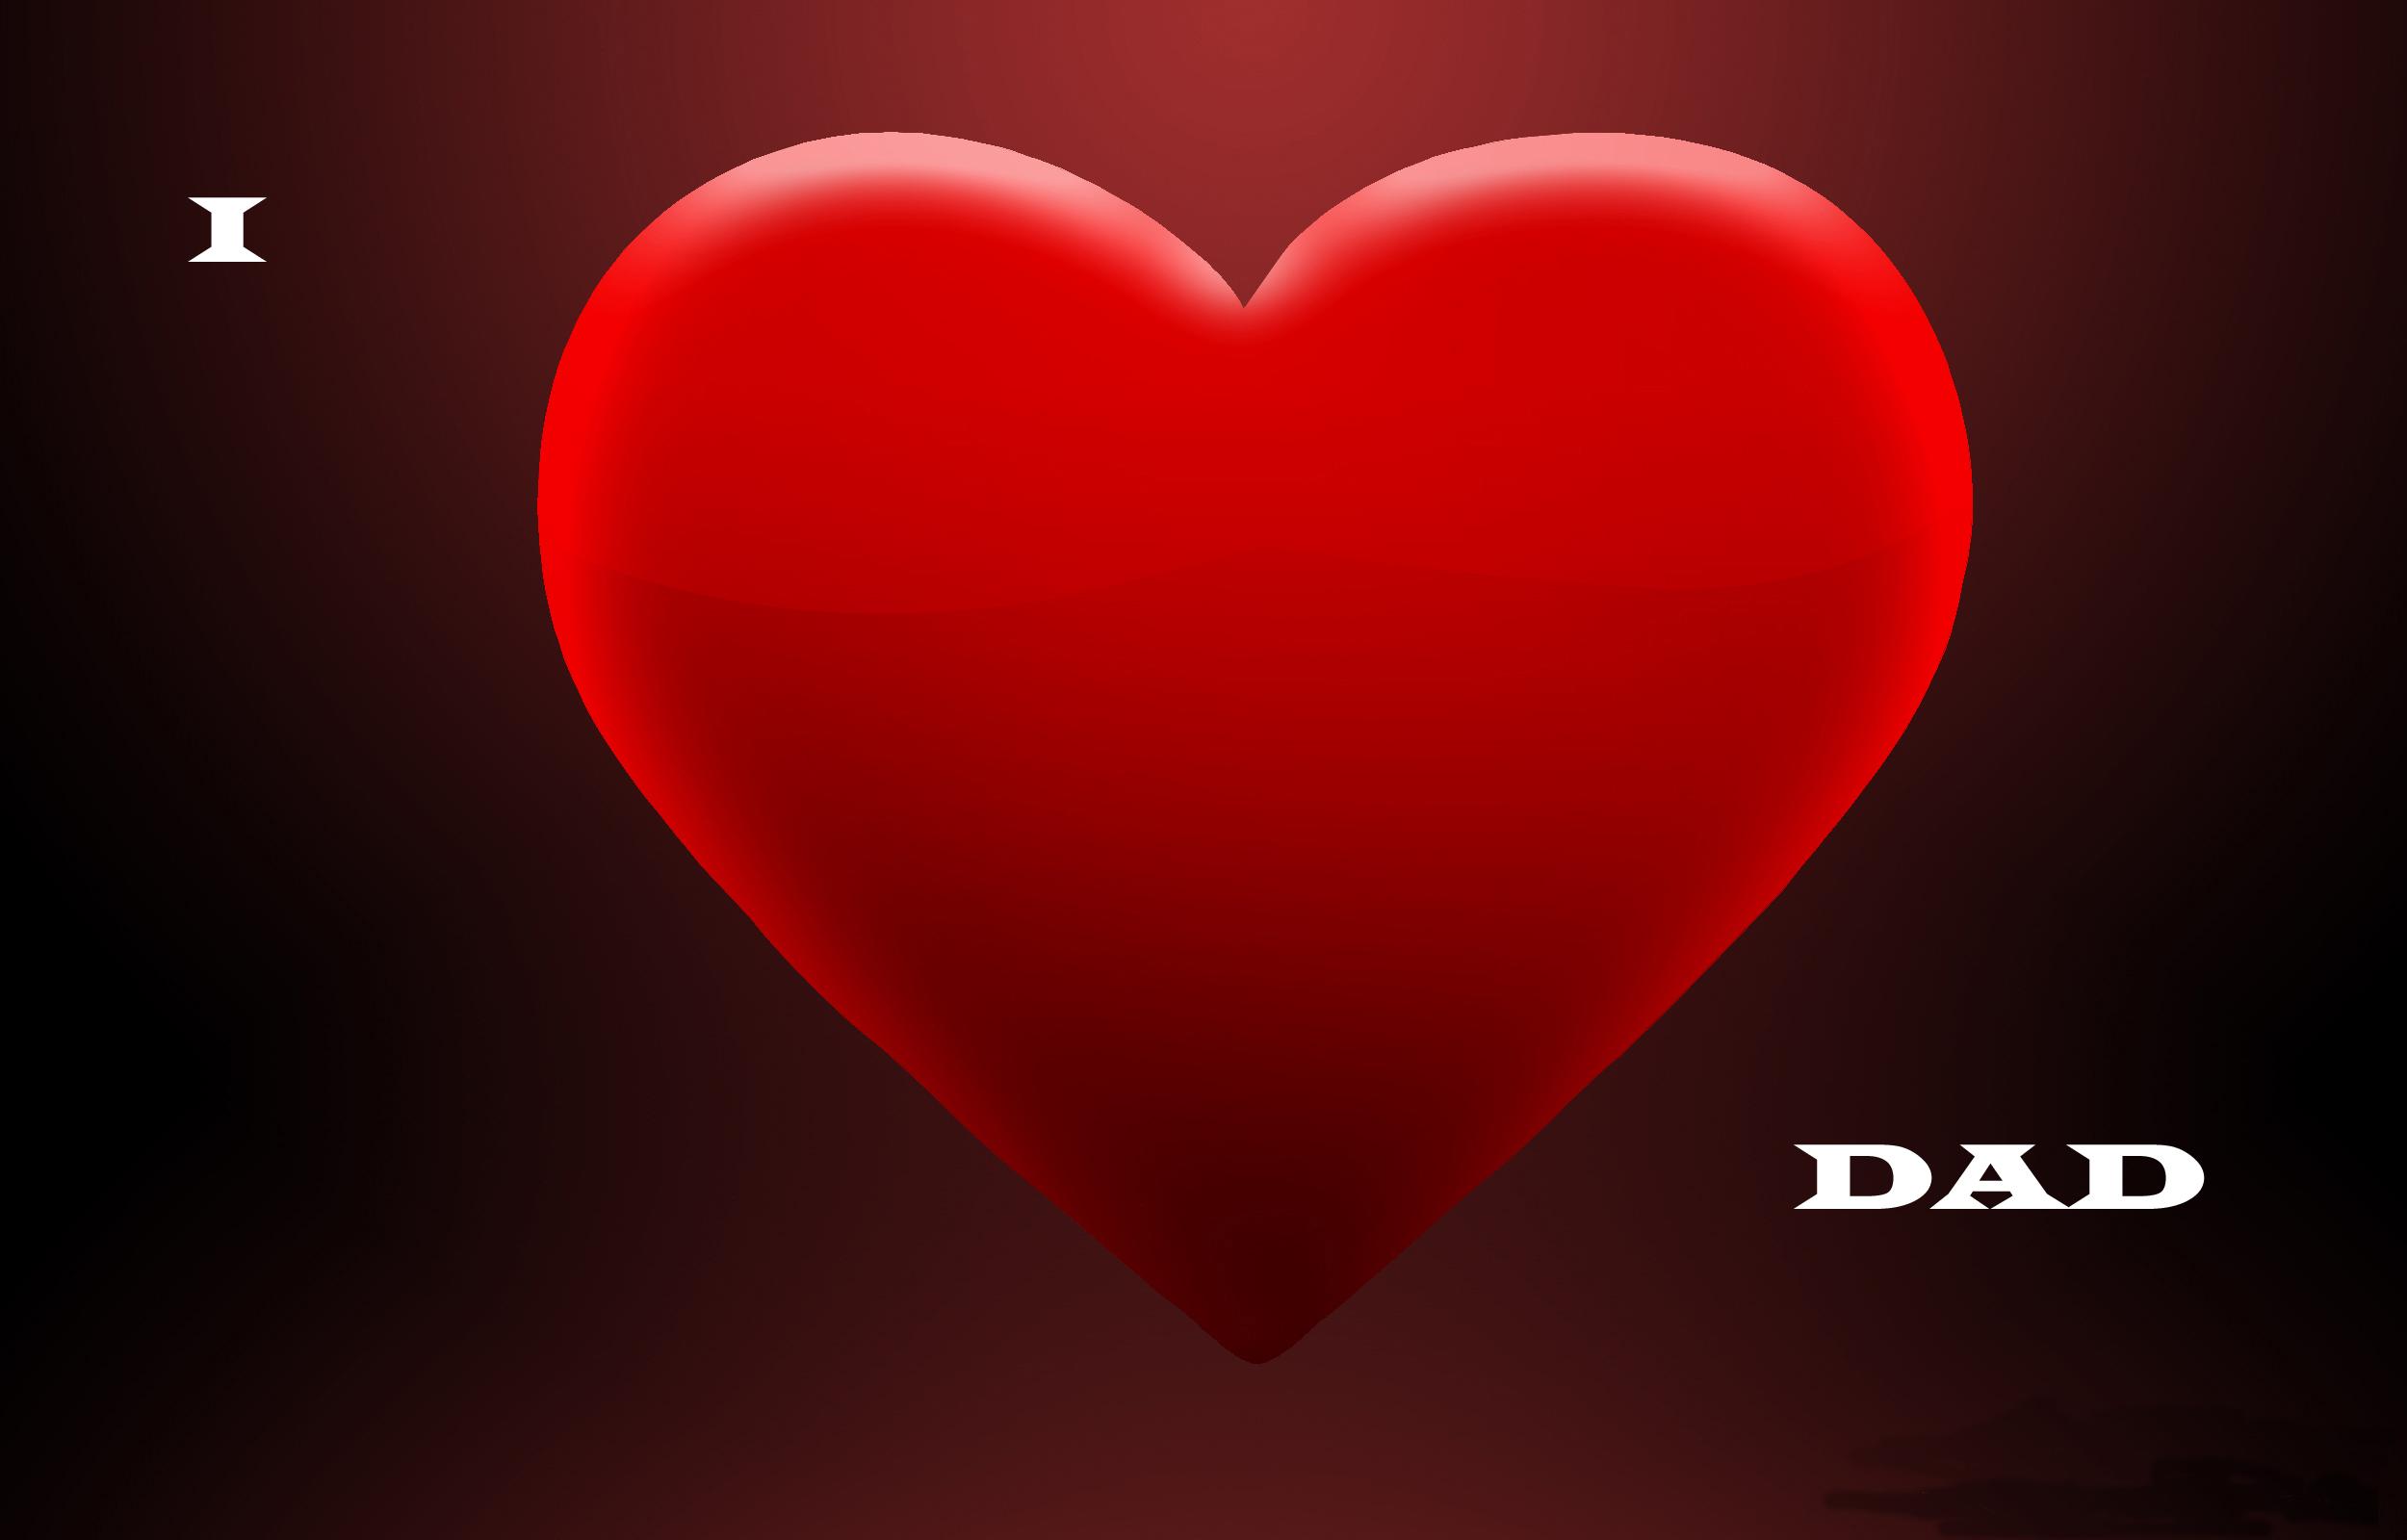 fathers day love heart wallpaper - hd wallpaper